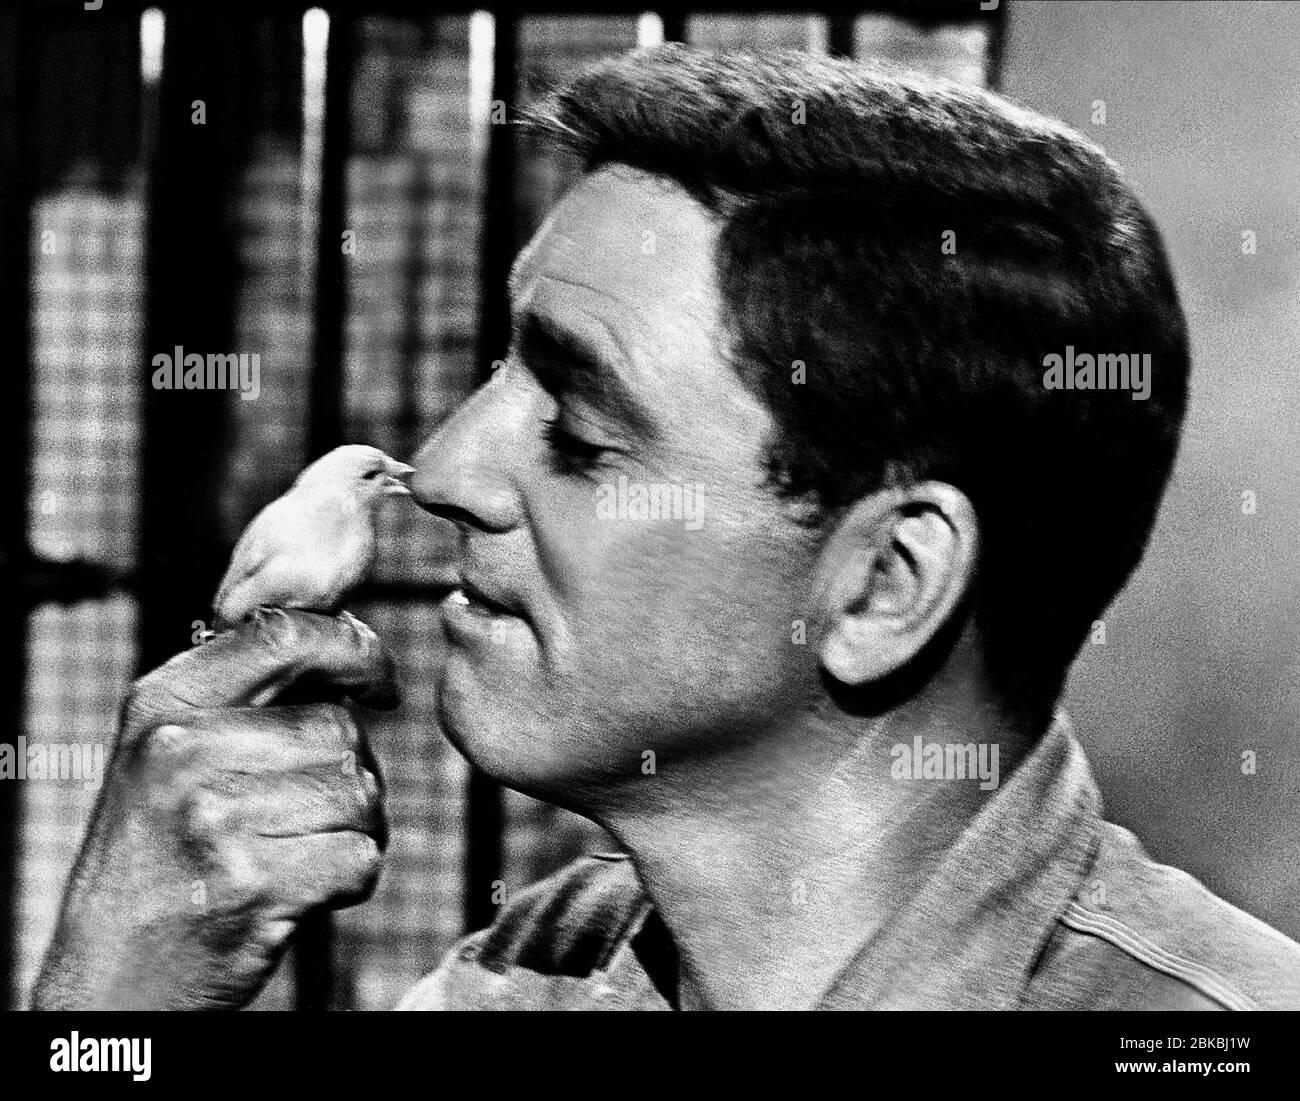 BURT LANCASTER, BIRD, THE BIRDMAN OF ALCATRAZ, 1962 Stock Photo